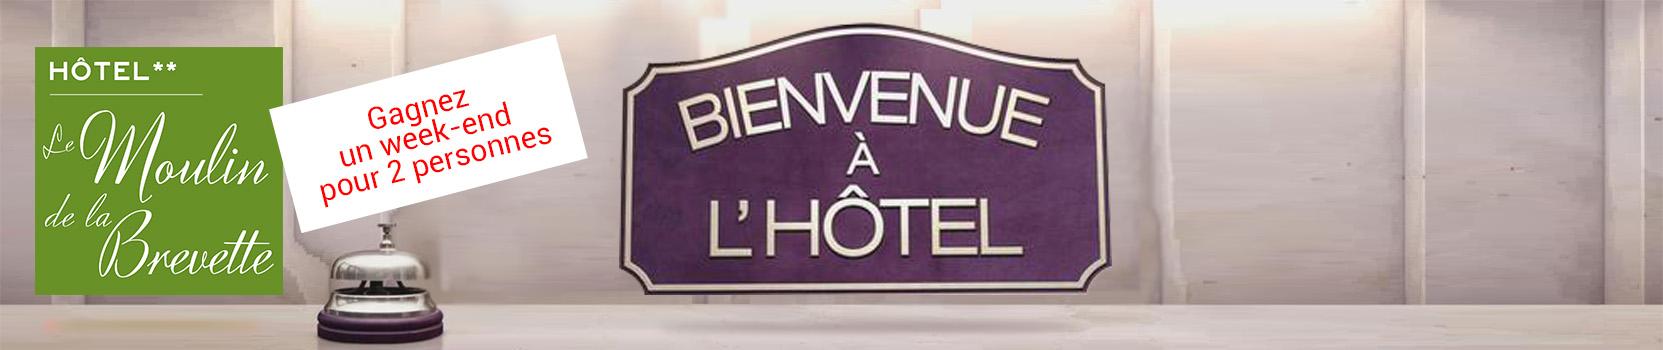 gagnez un week end-hotel-moulin-de-la-brevette-arbigny